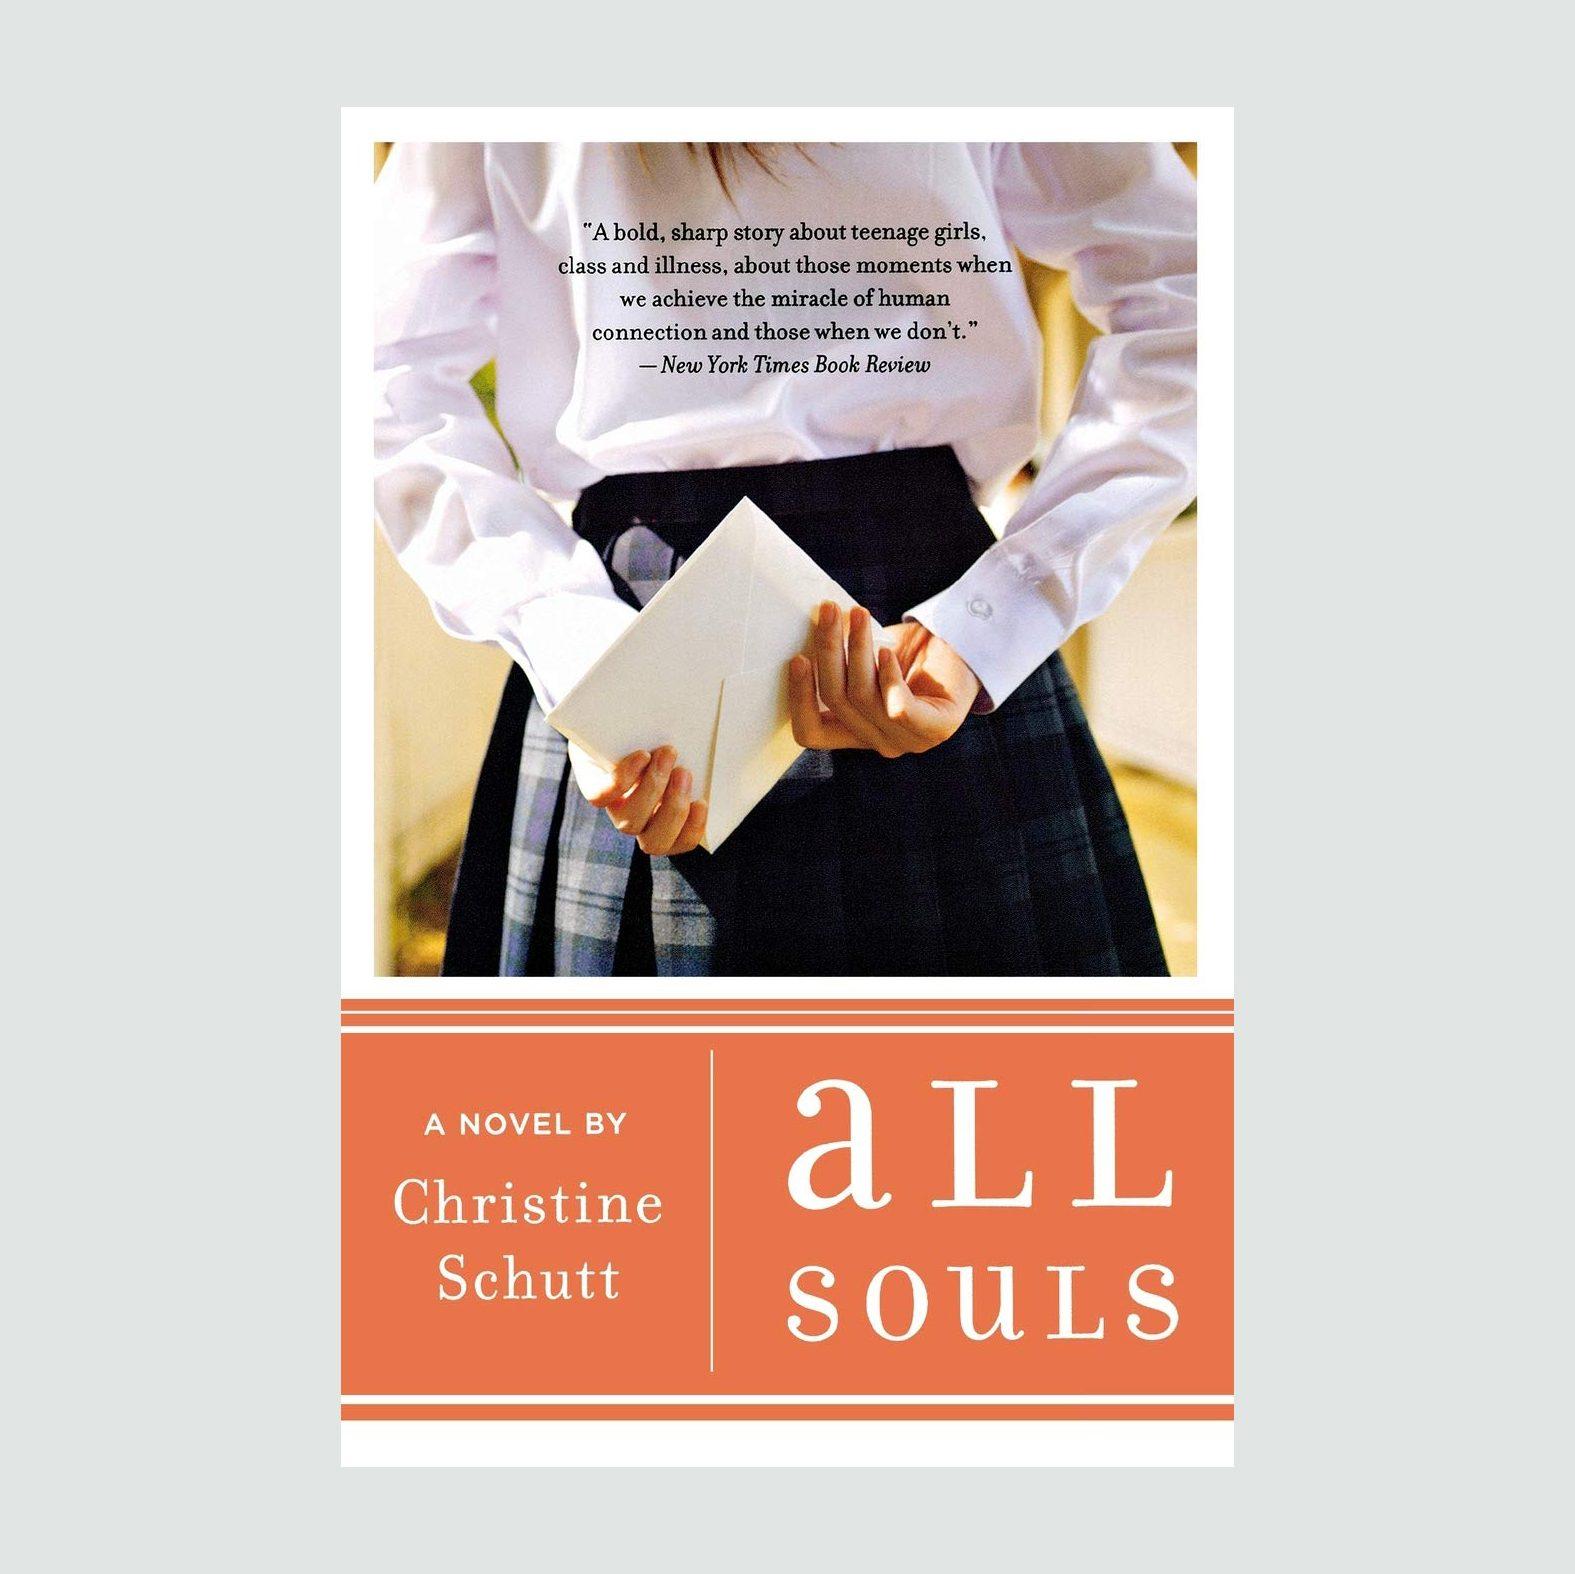 Christine Schutt all souls book